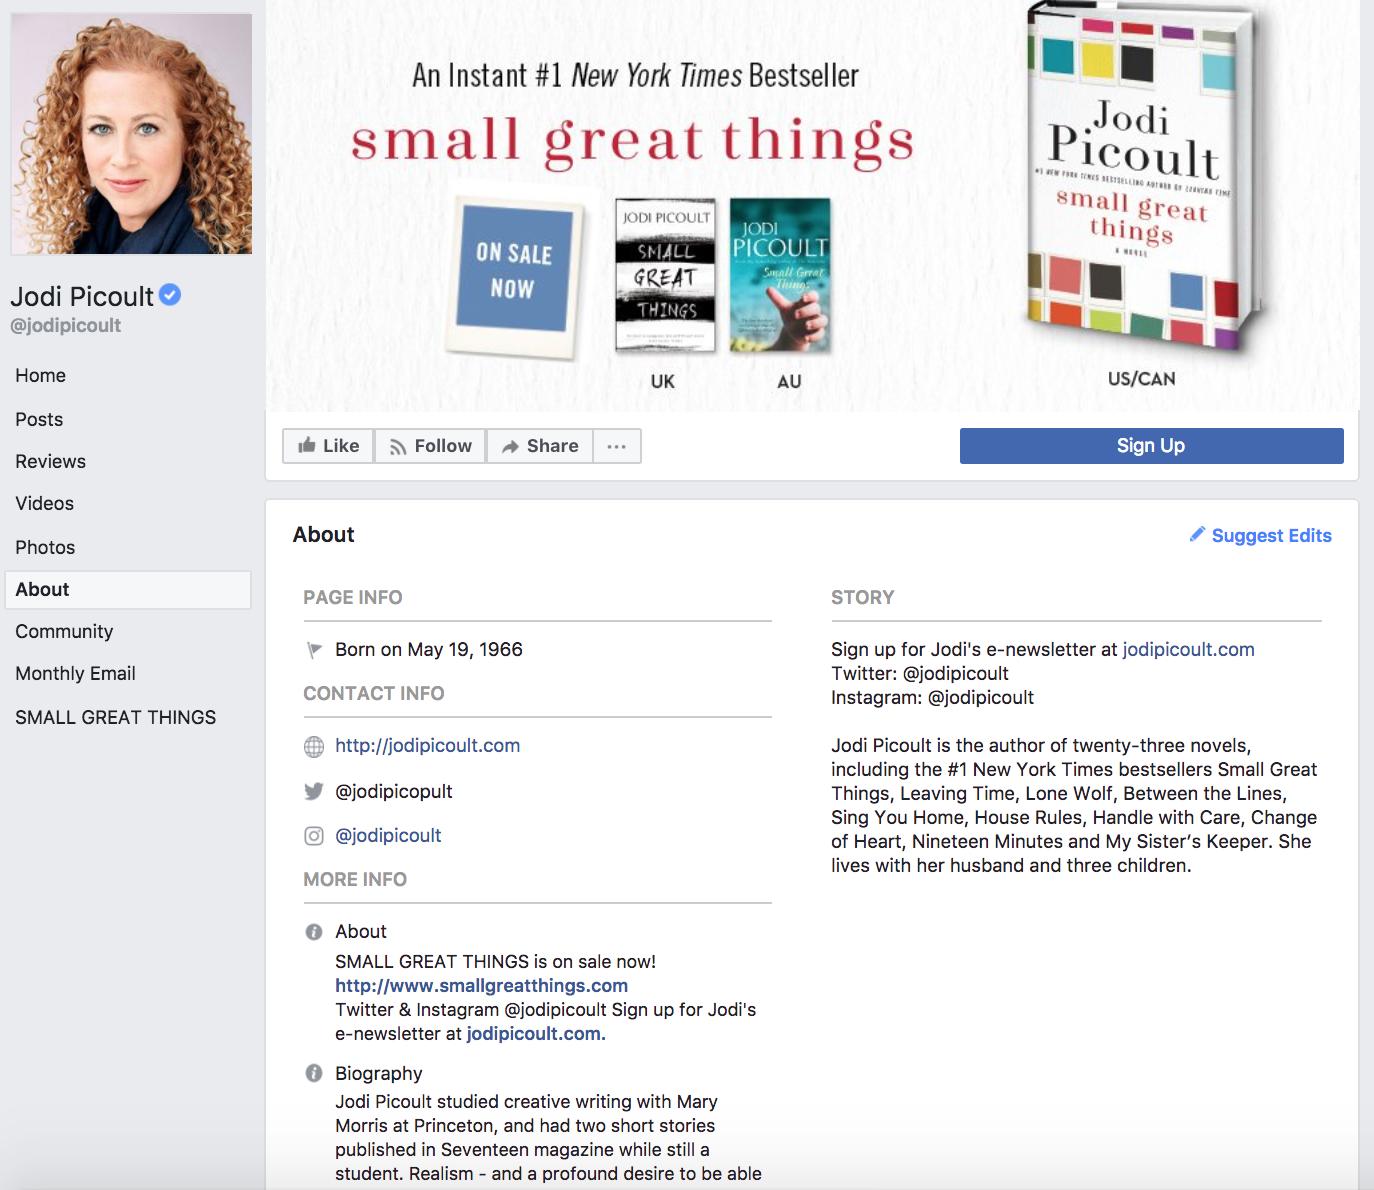 Author Jodi Picoult Facebook About Page